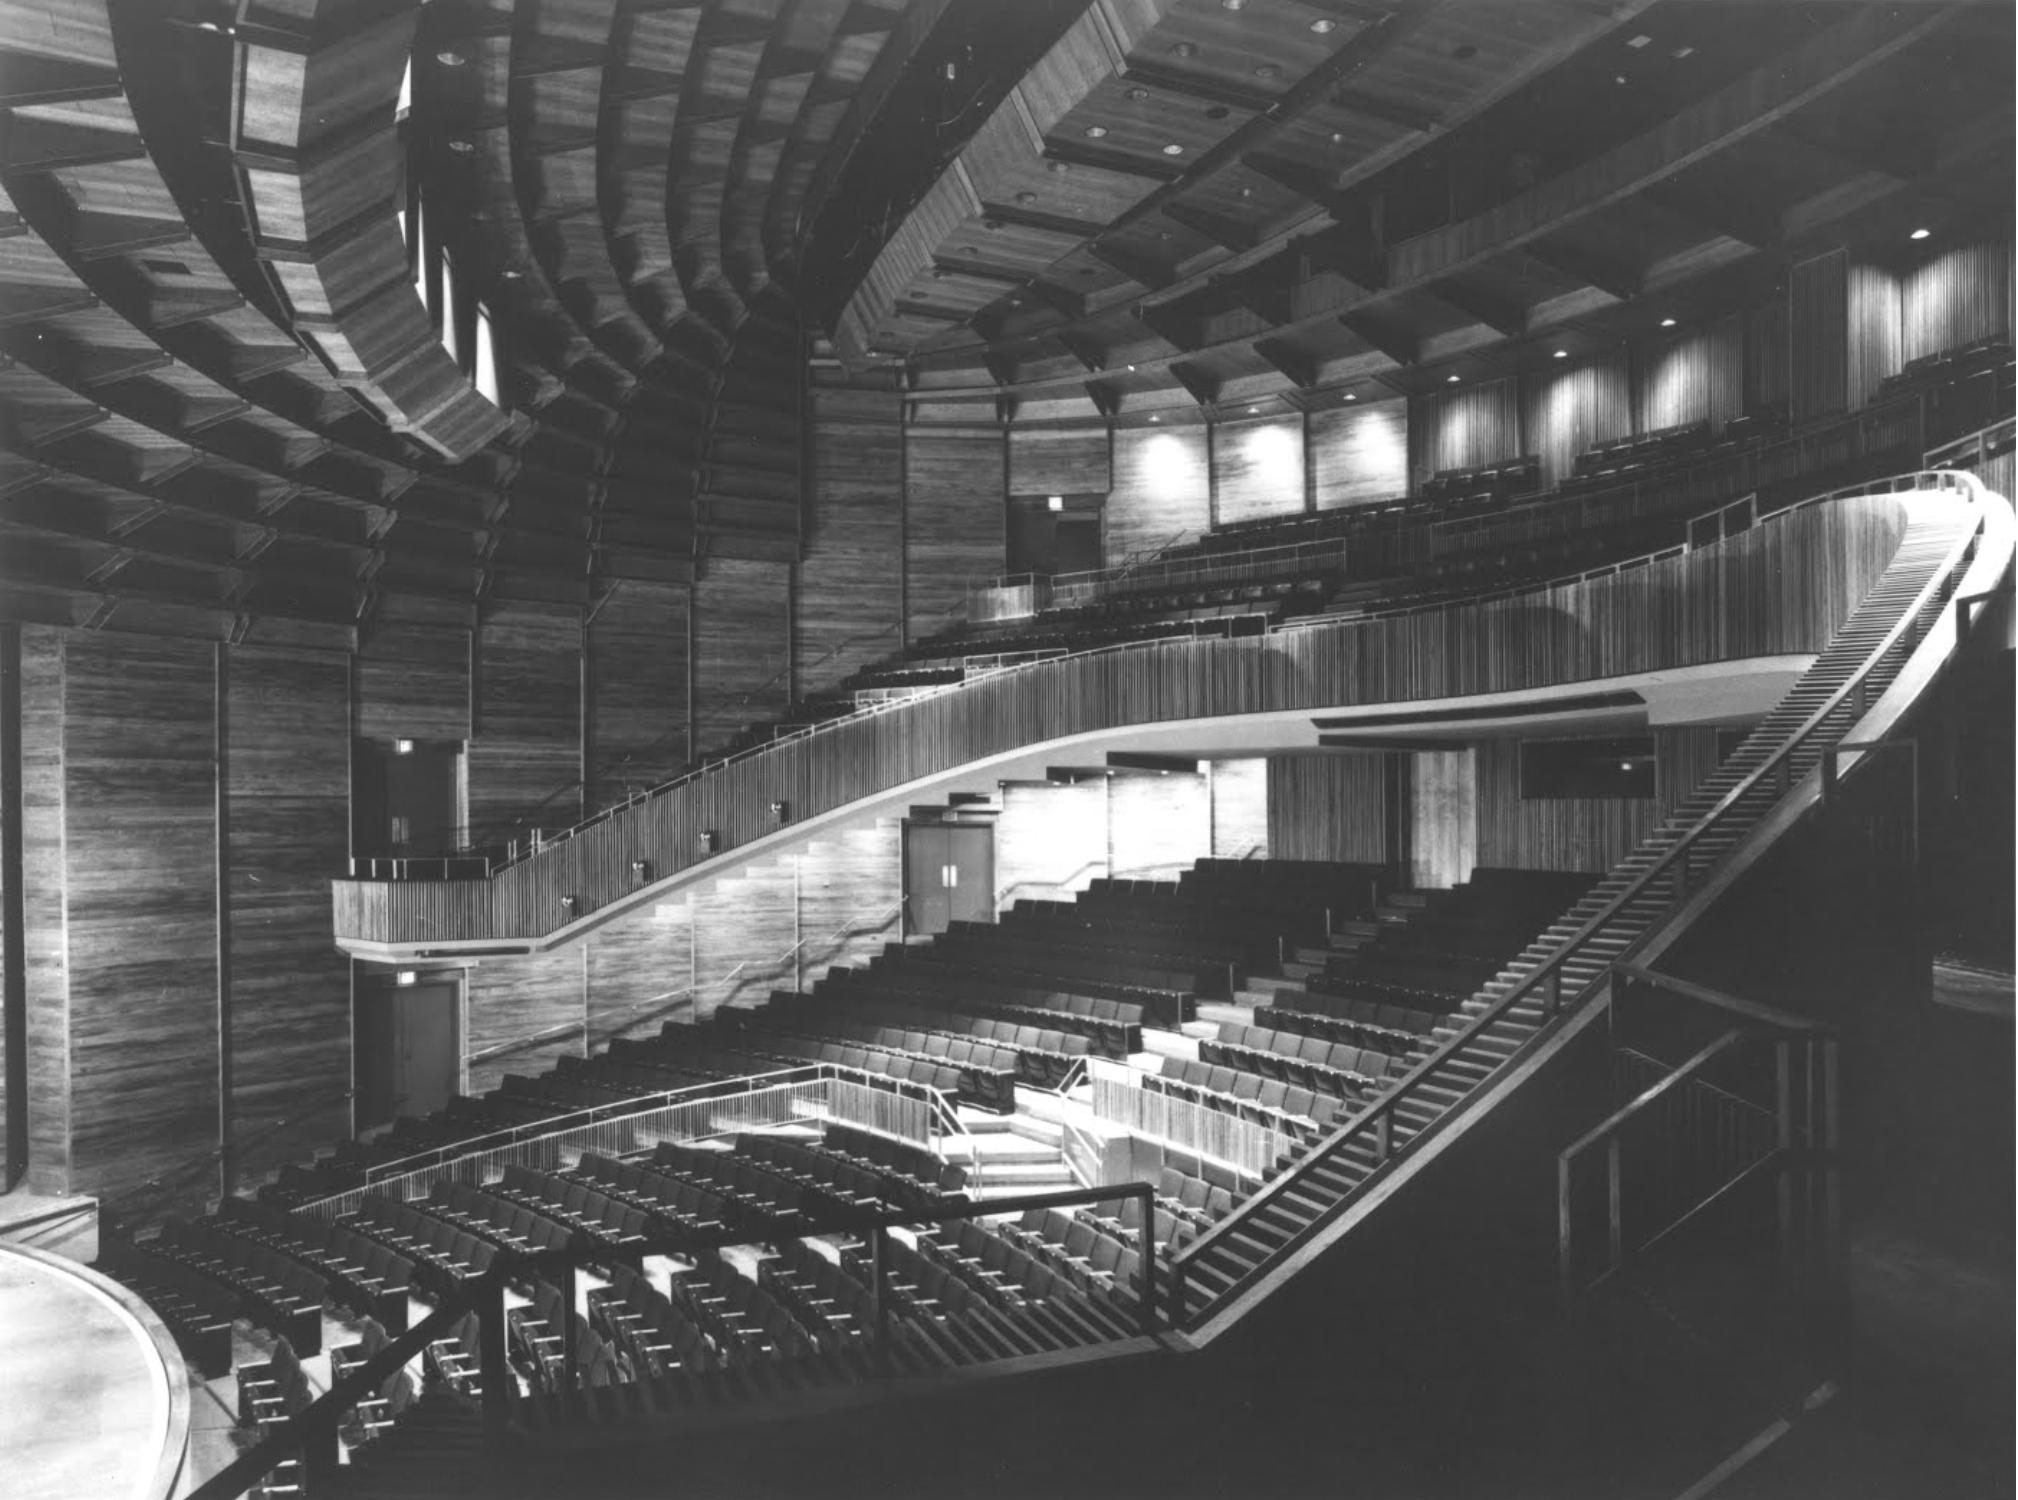 Auditorium of The Juilliard Theater, which seats 1,026.